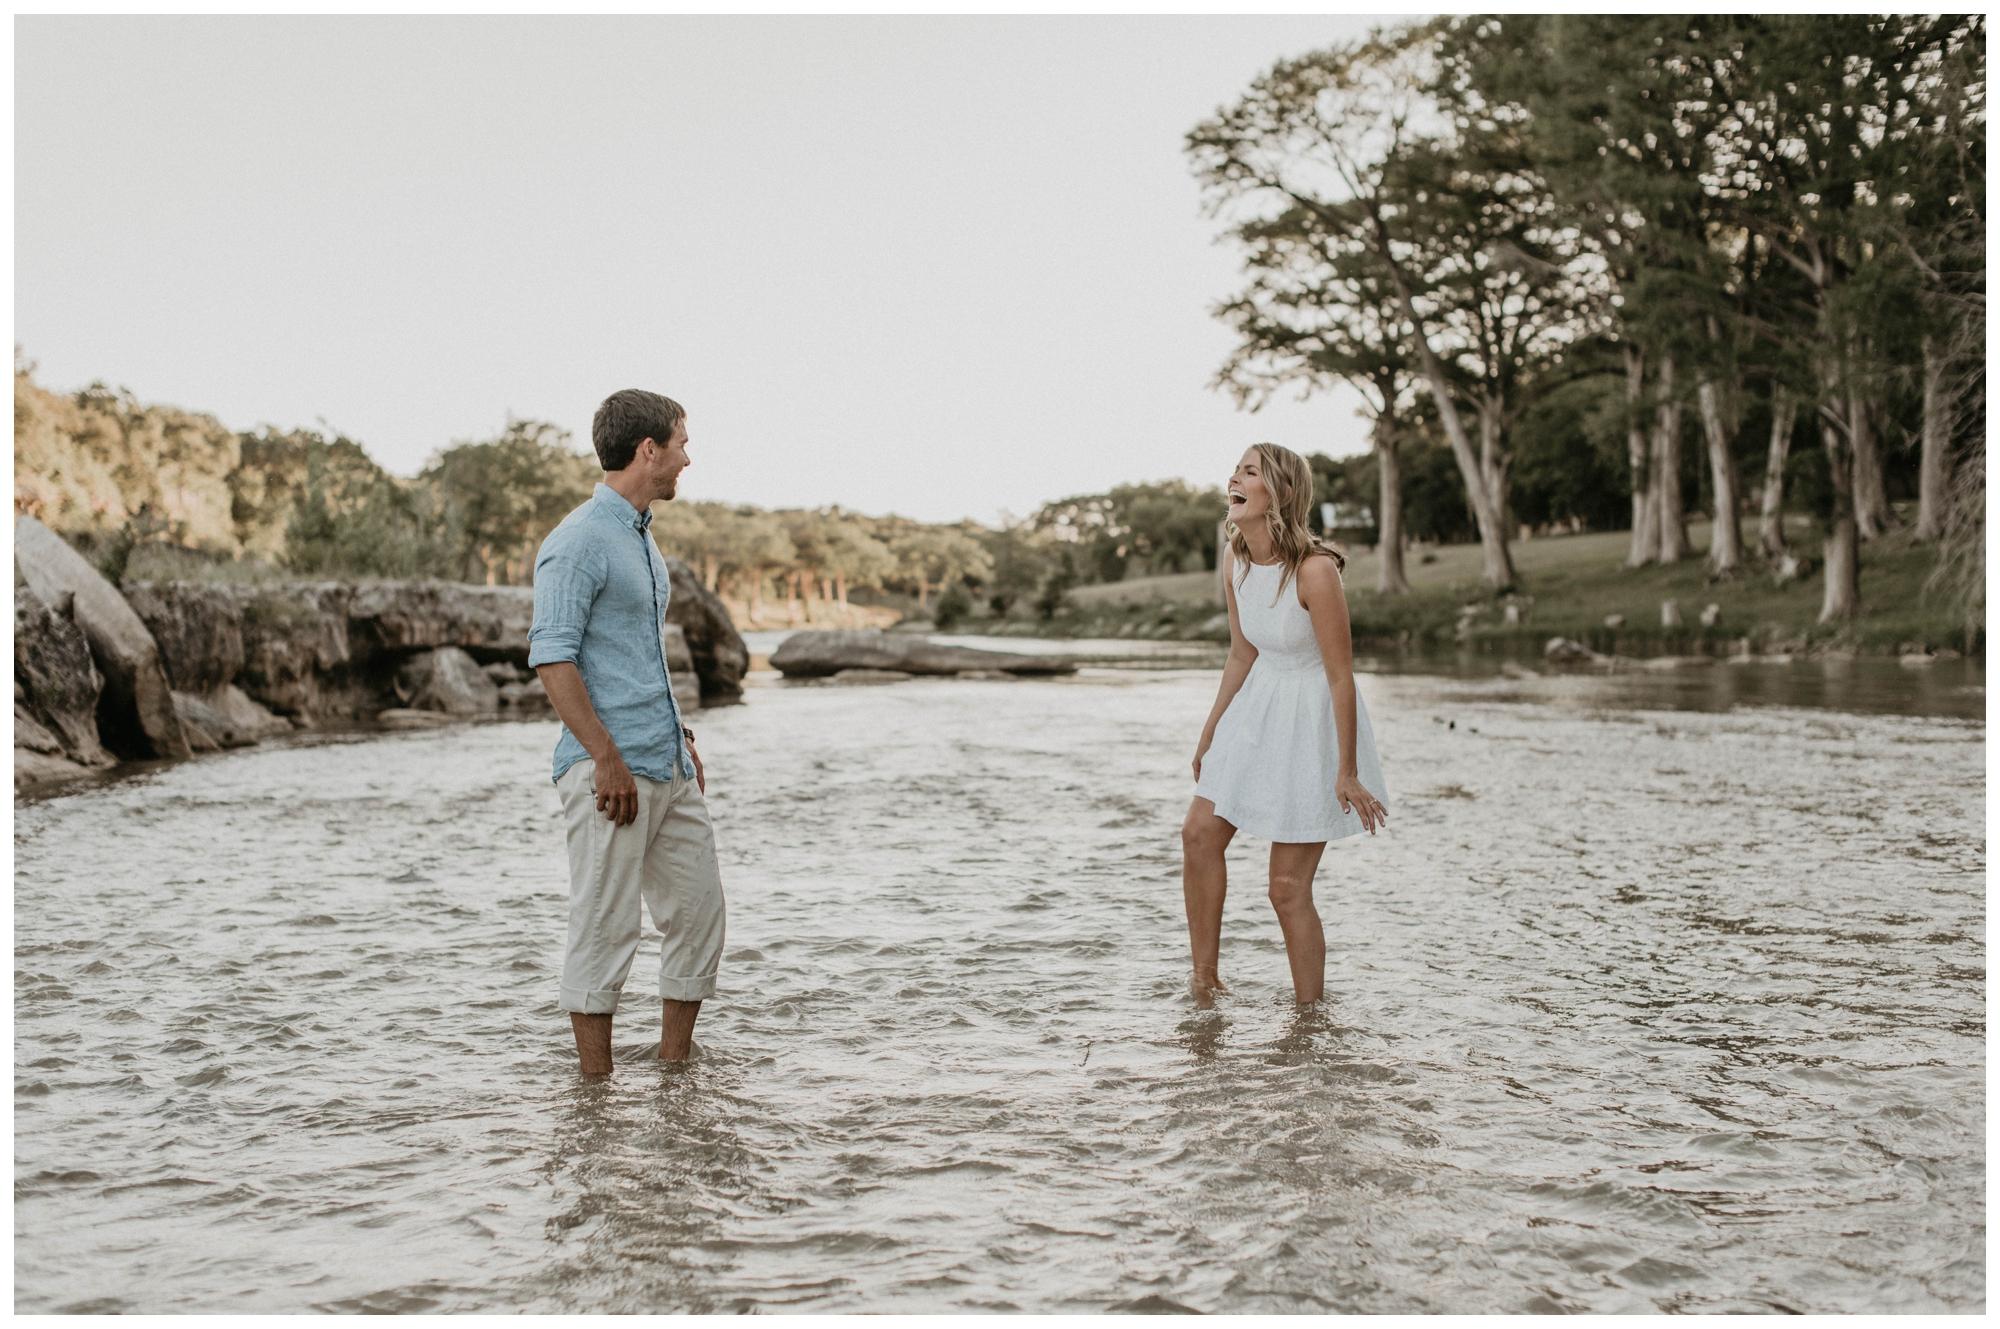 austin-texas-wedding-photography-1778-photographie_0148.jpg